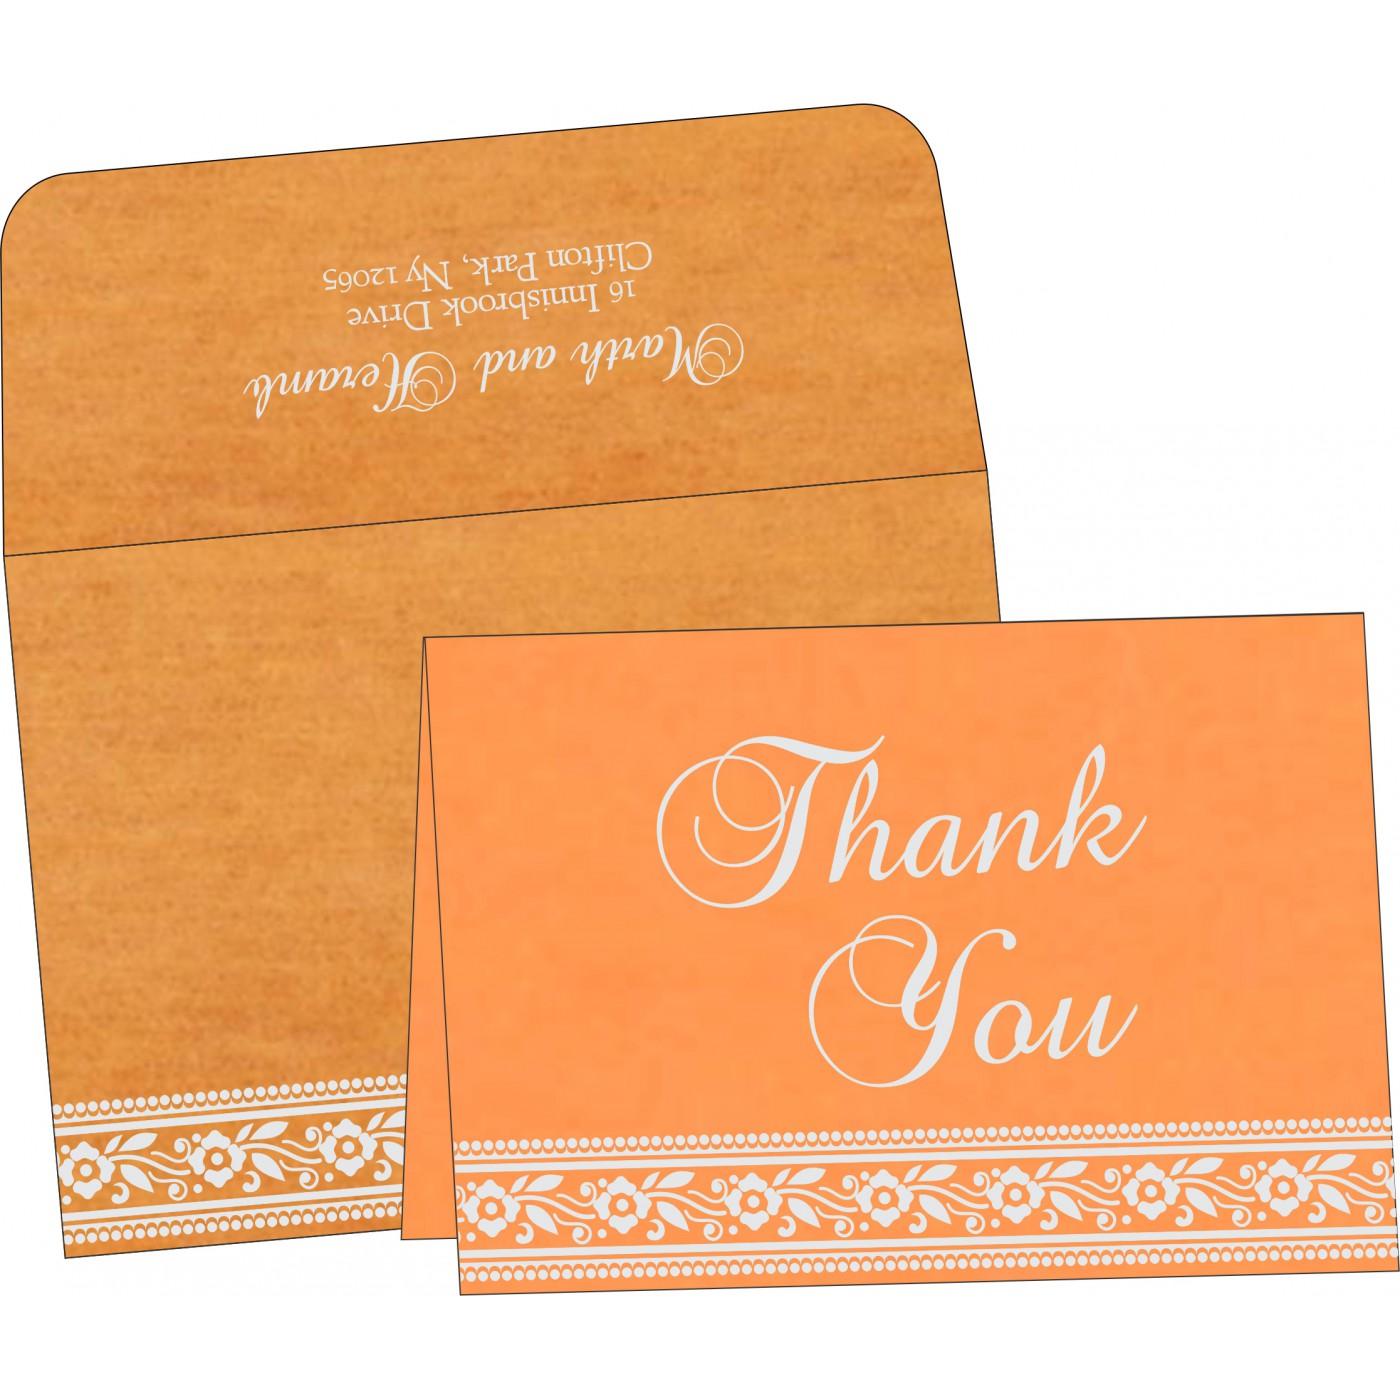 Thank You Cards : TYC-8220F - 123WeddingCards